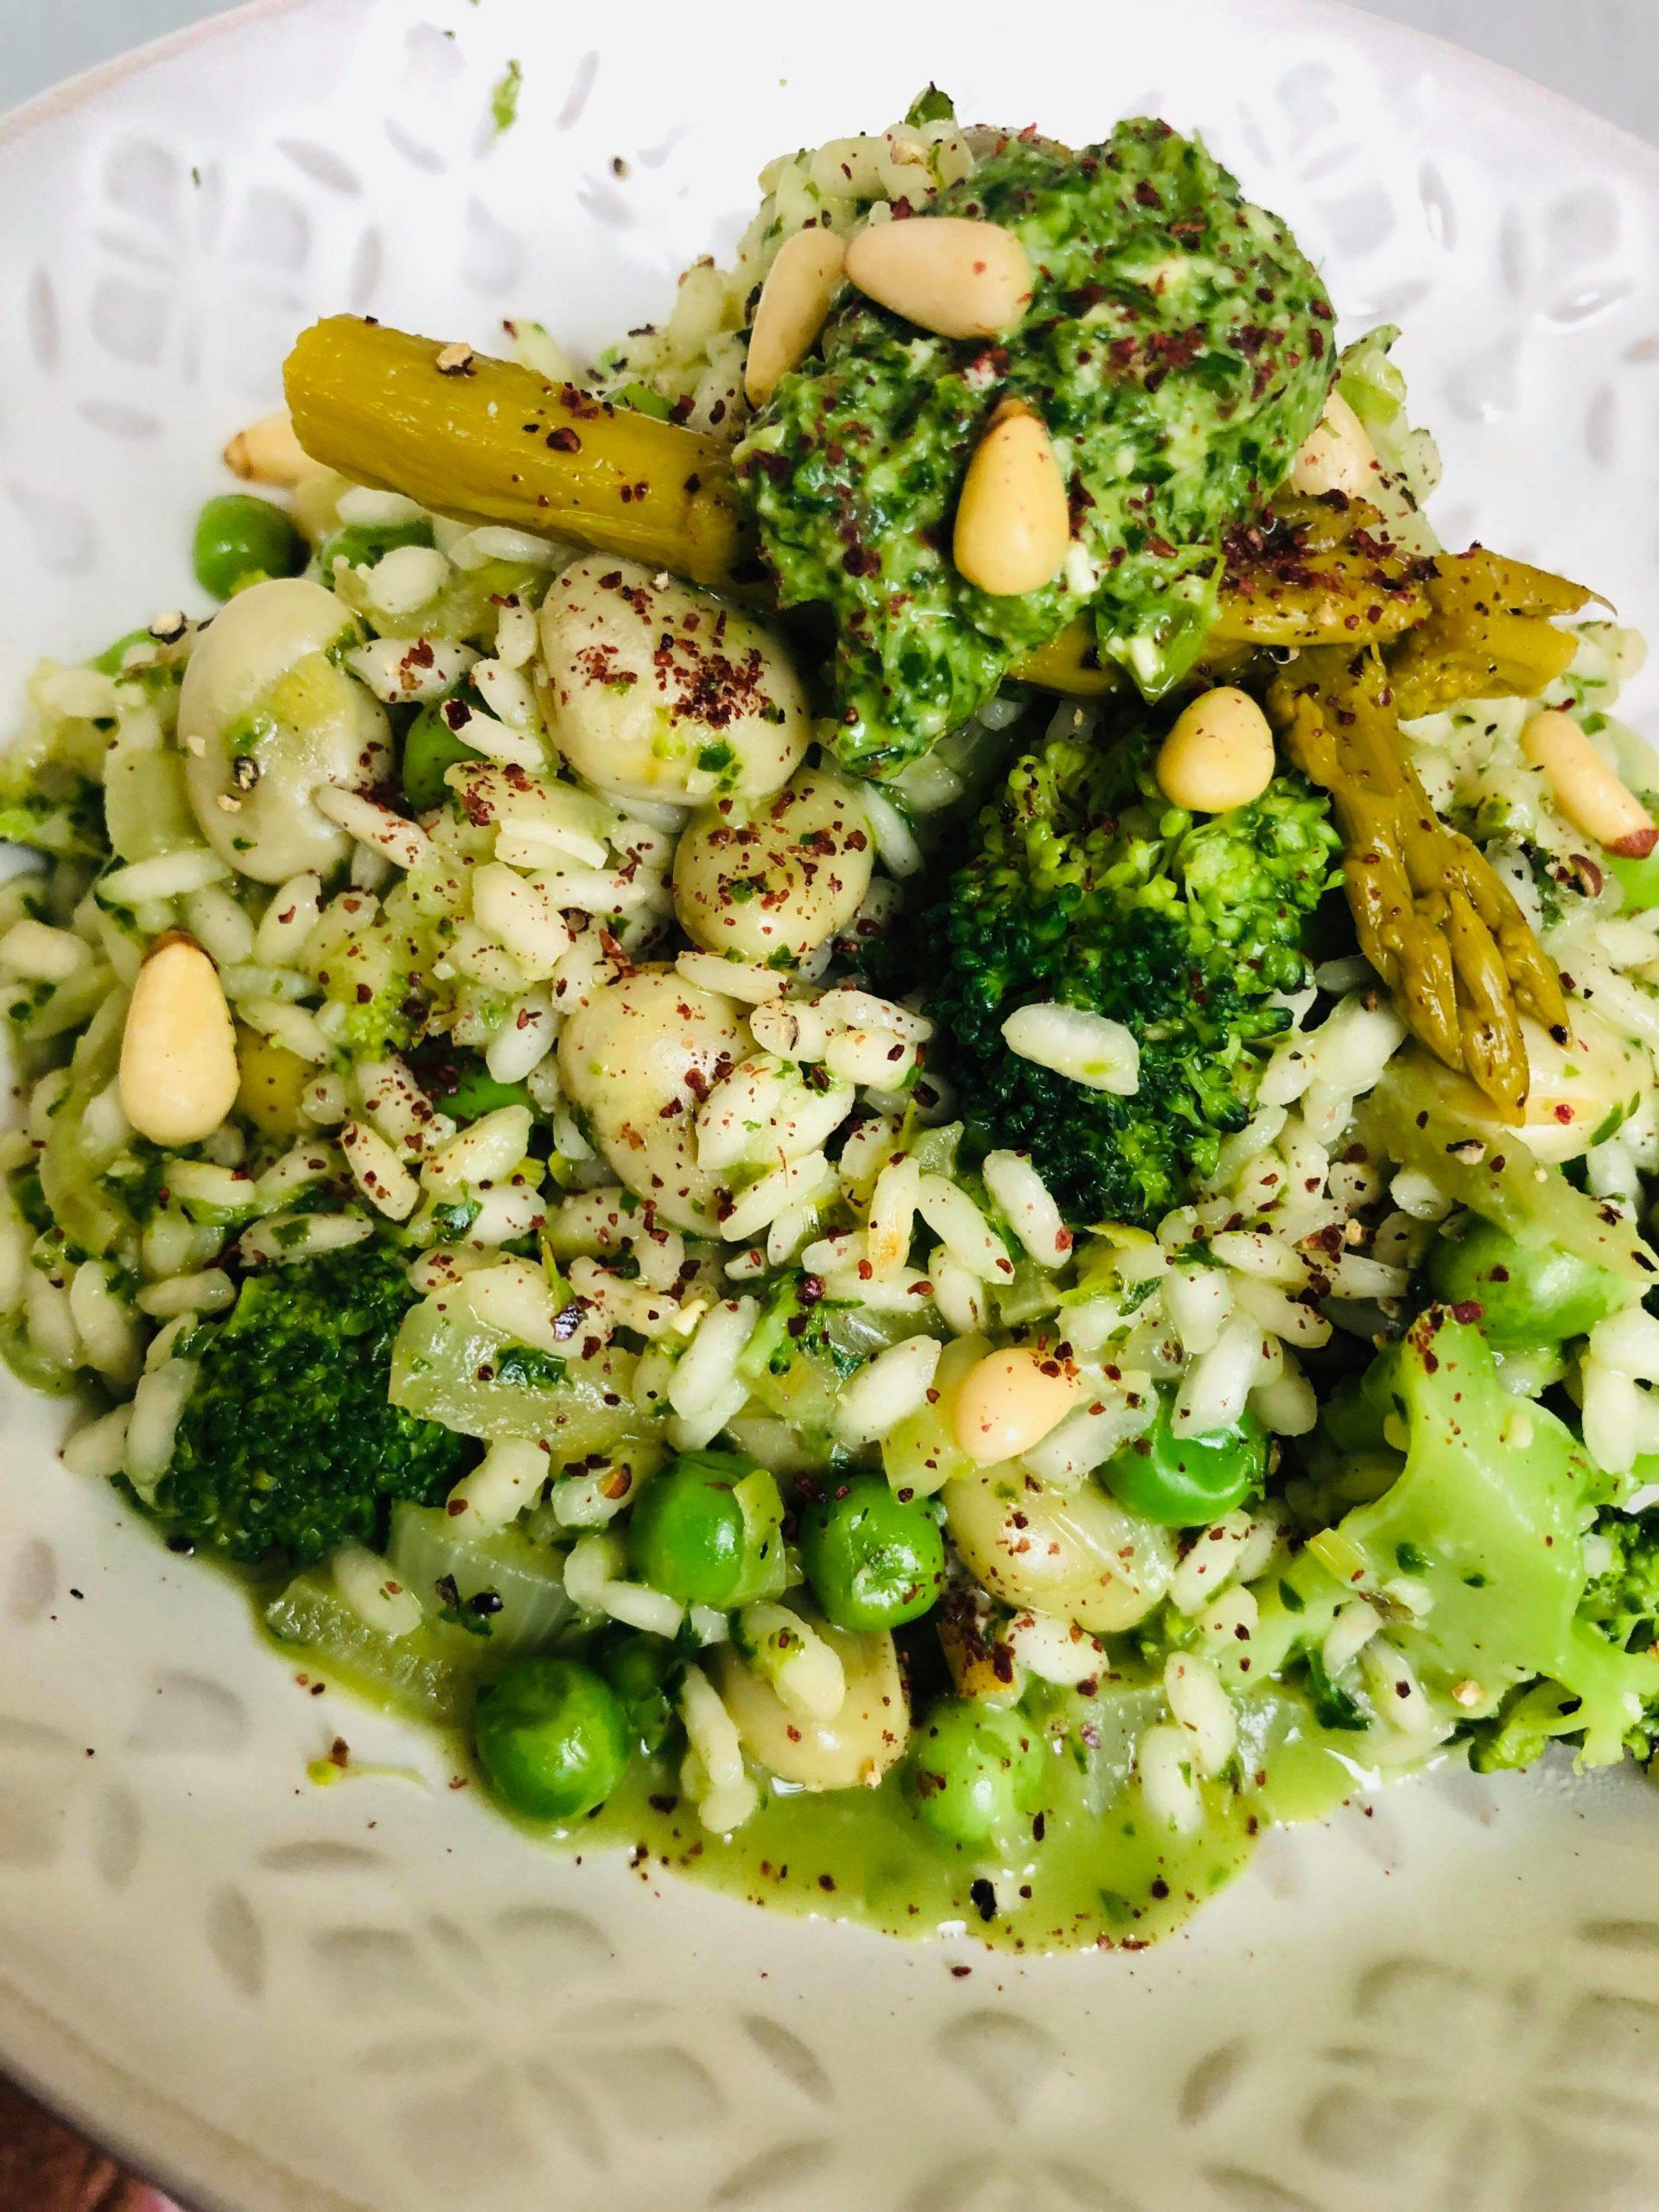 Easy Super-Green Vegan Vegetable Risotto